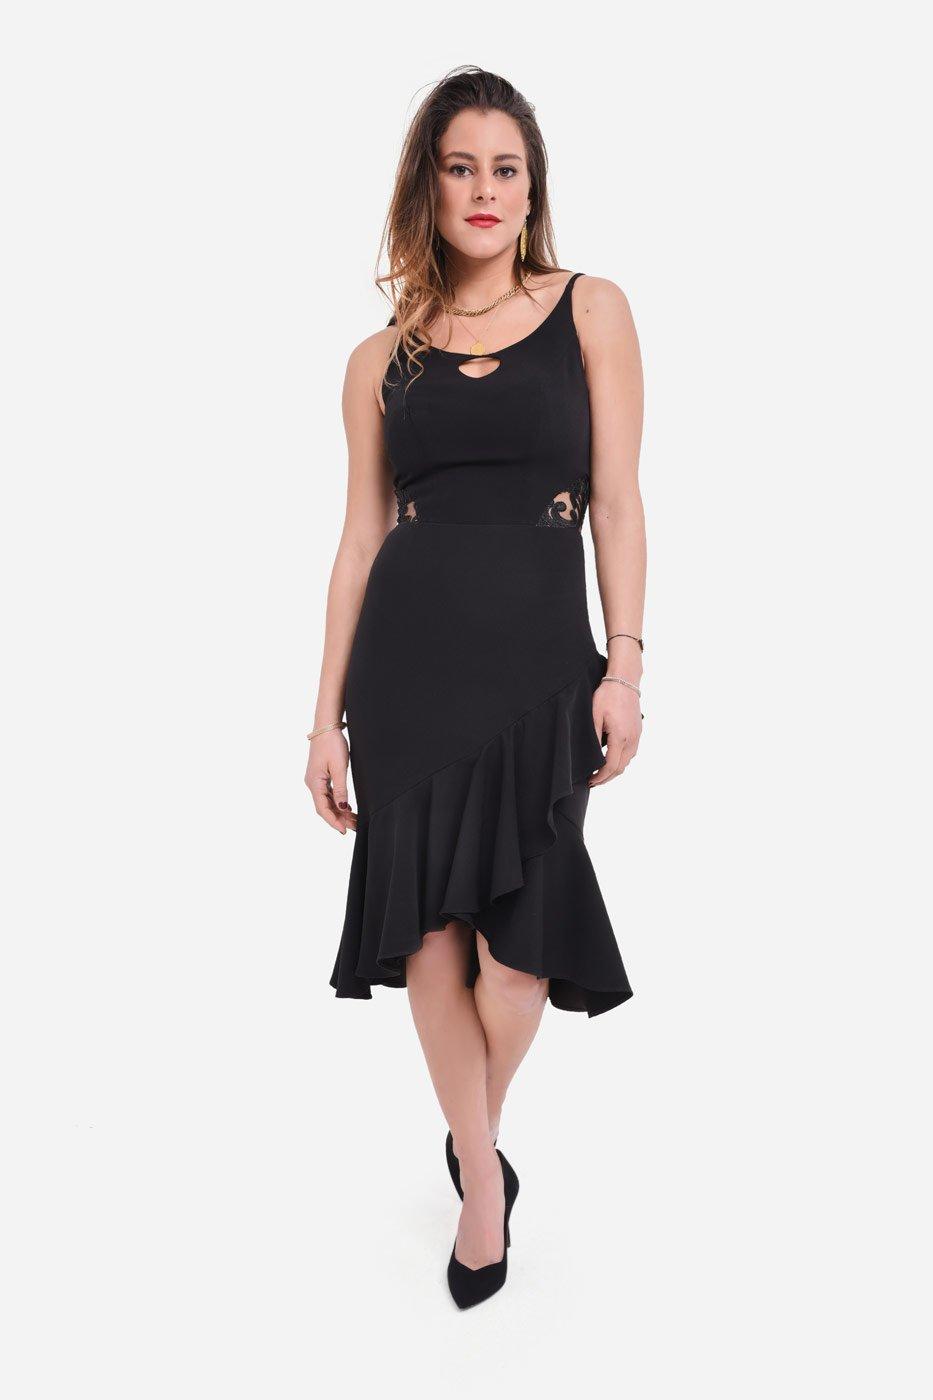 The black Swan Dress thumbnail